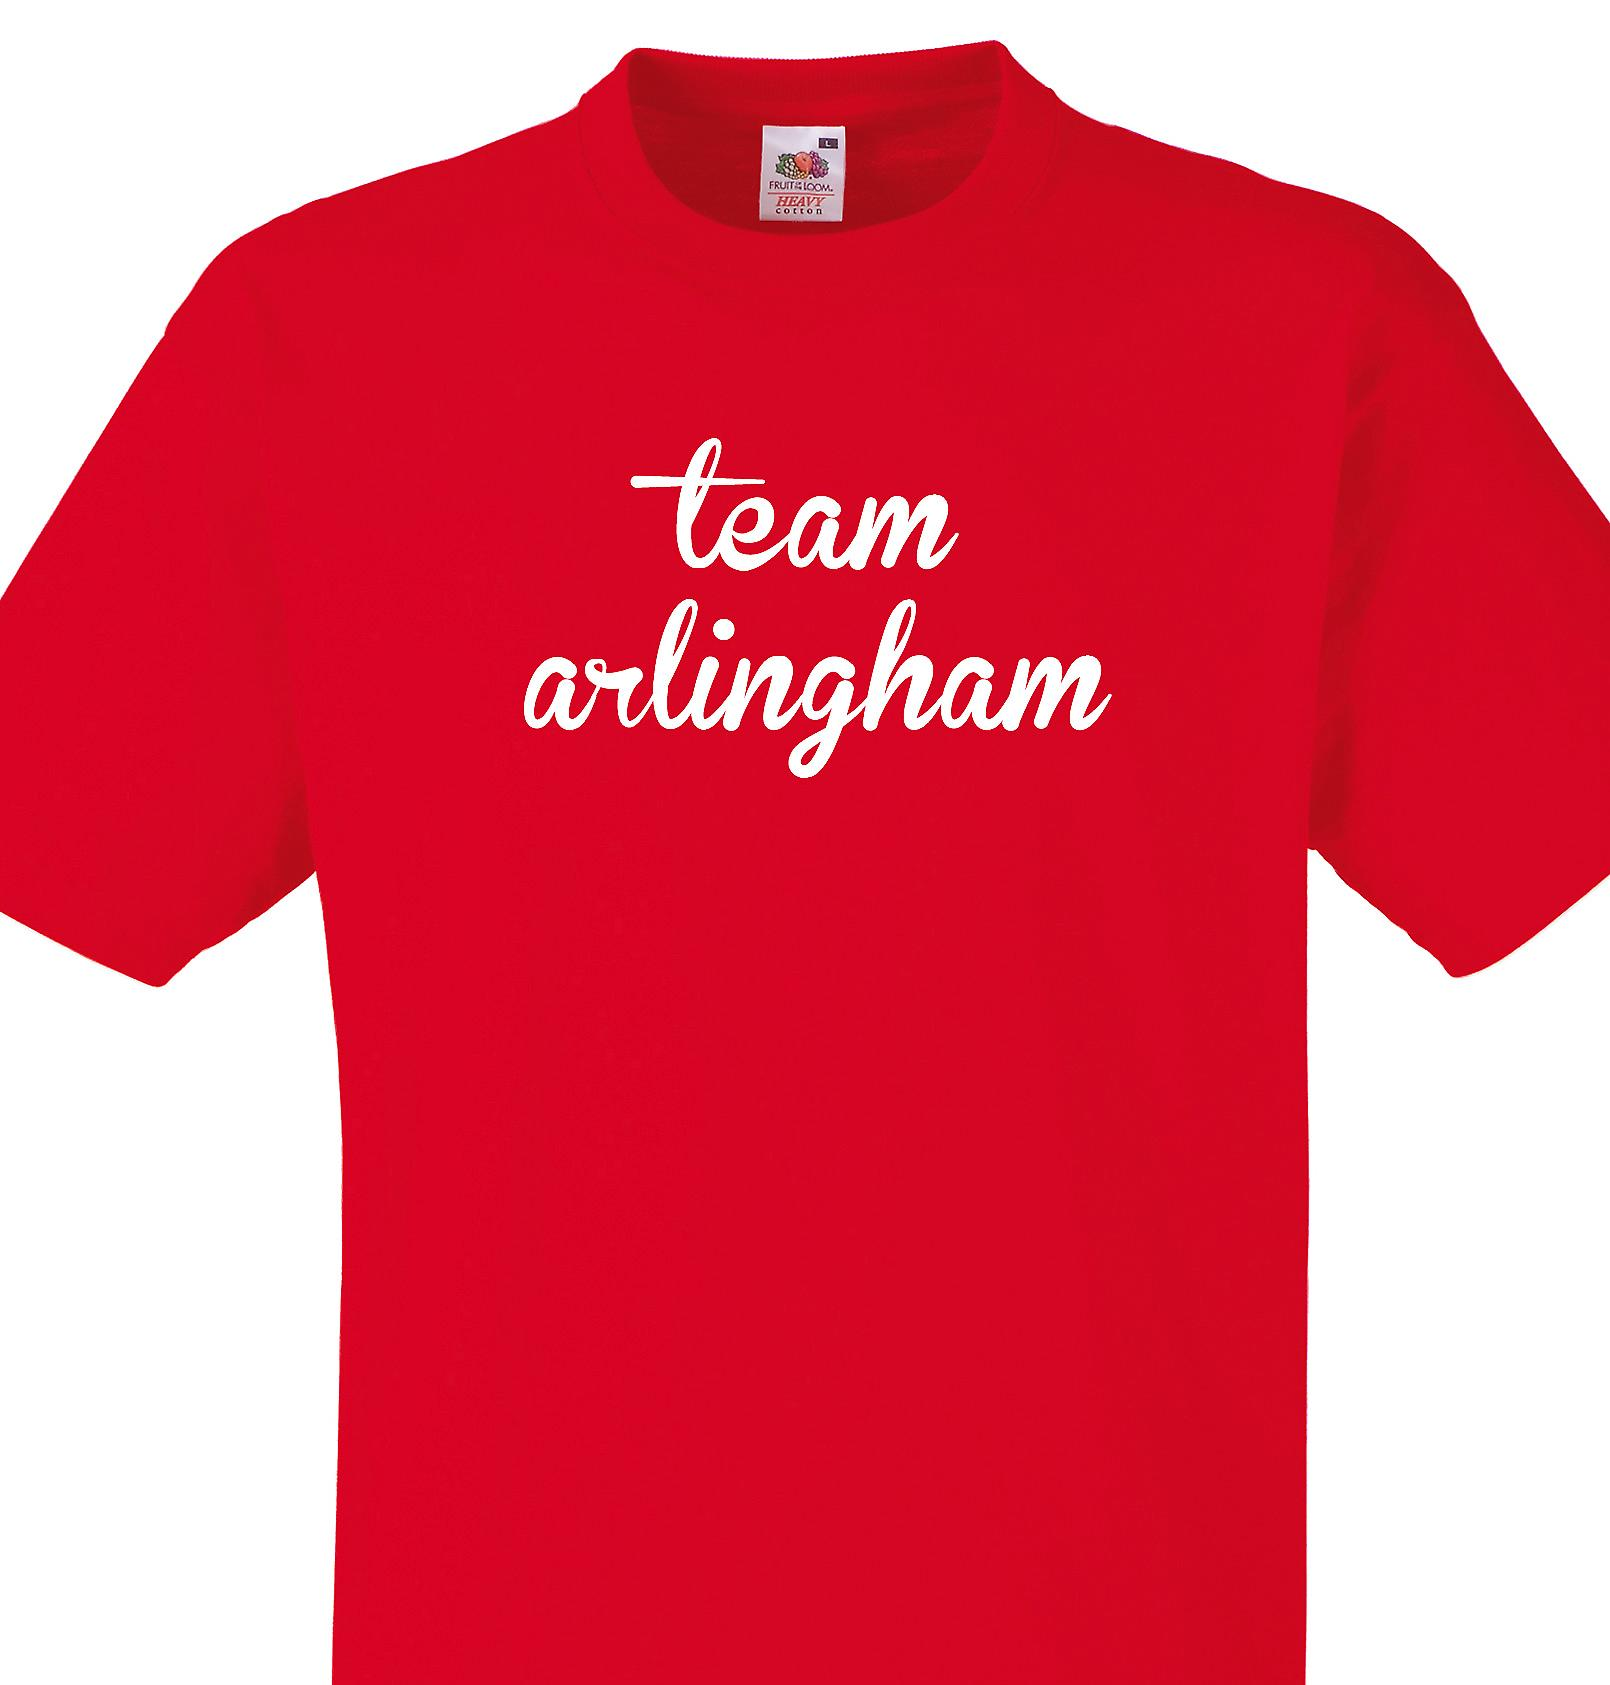 Team Arlingham Red T shirt